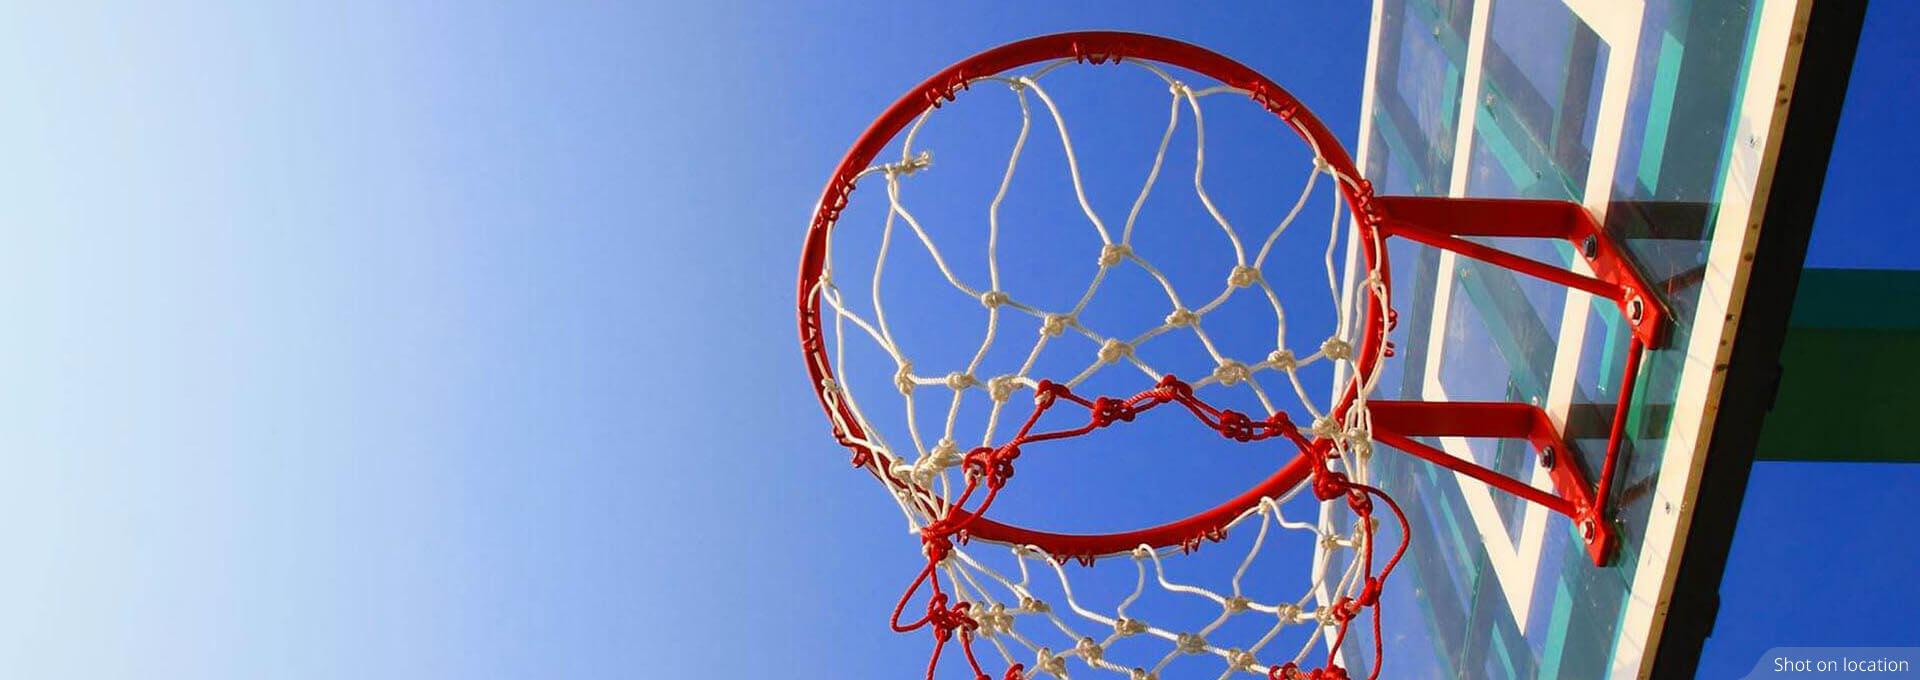 Basket ball Court near Villas  by House of Hiranandani in Devanahalli, Bengaluru